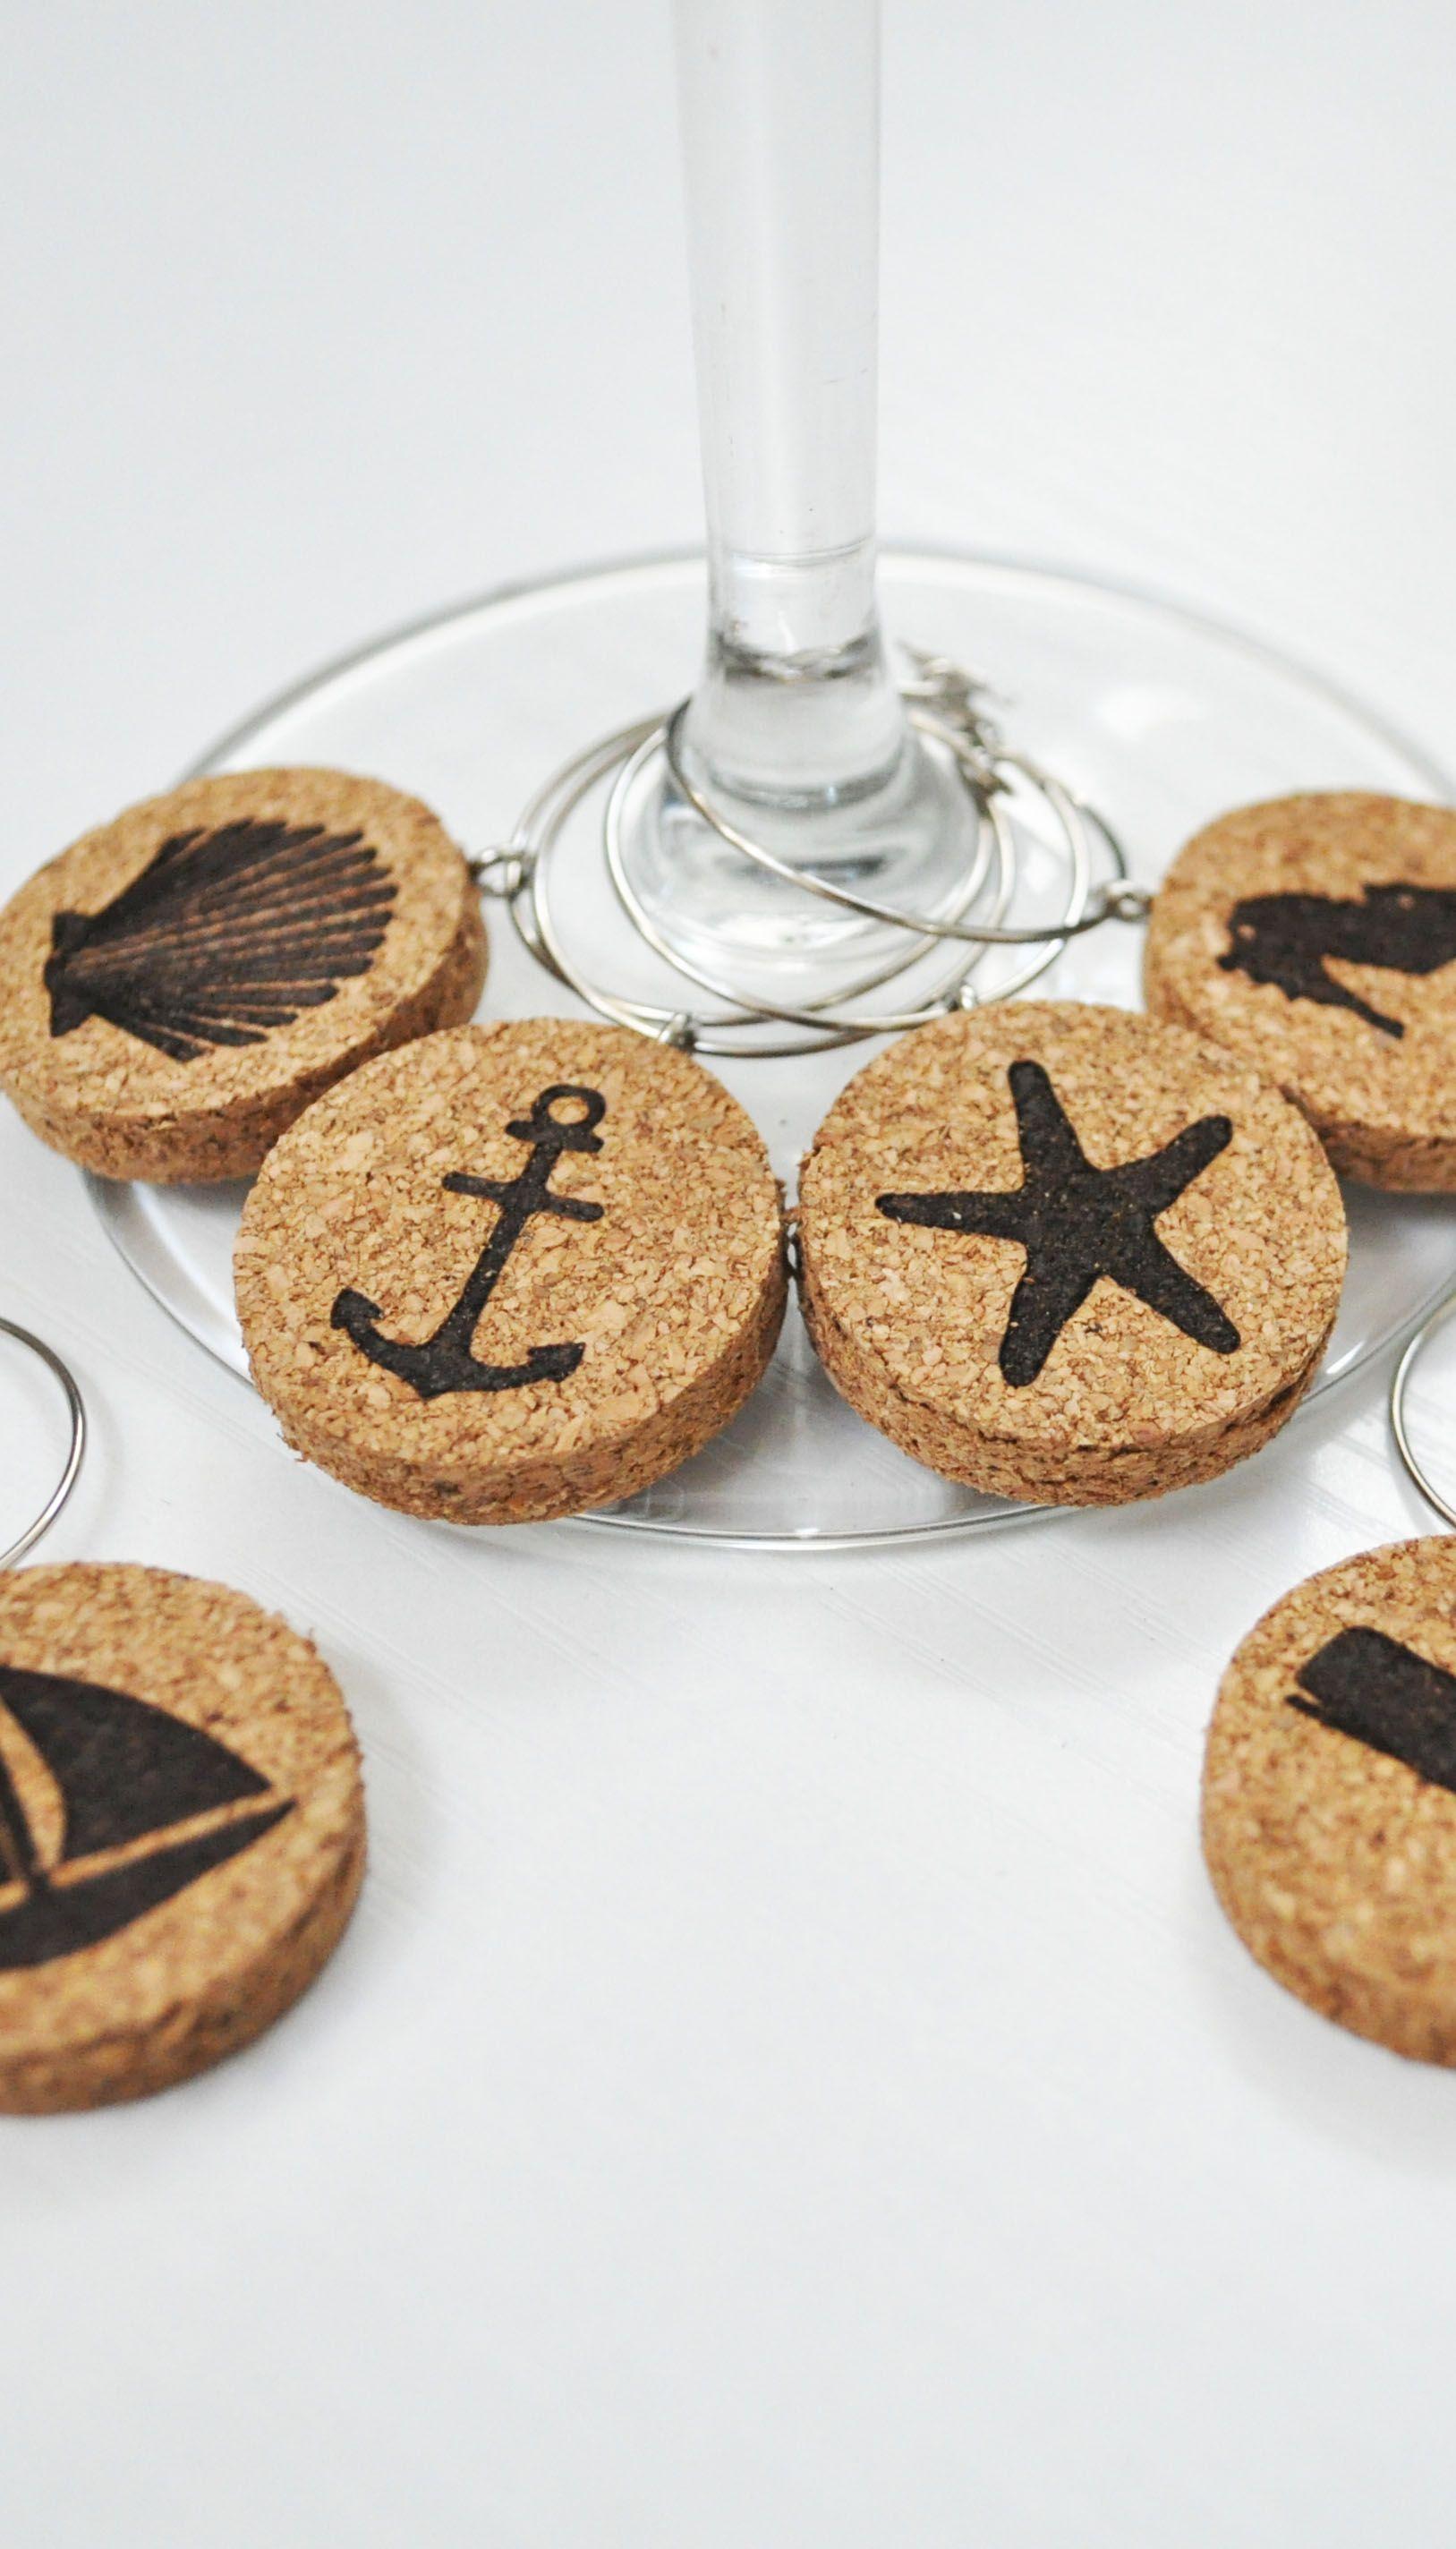 Cork Nautical Wine Glass Charms – Set of 6 | Pinterest | Wine ...